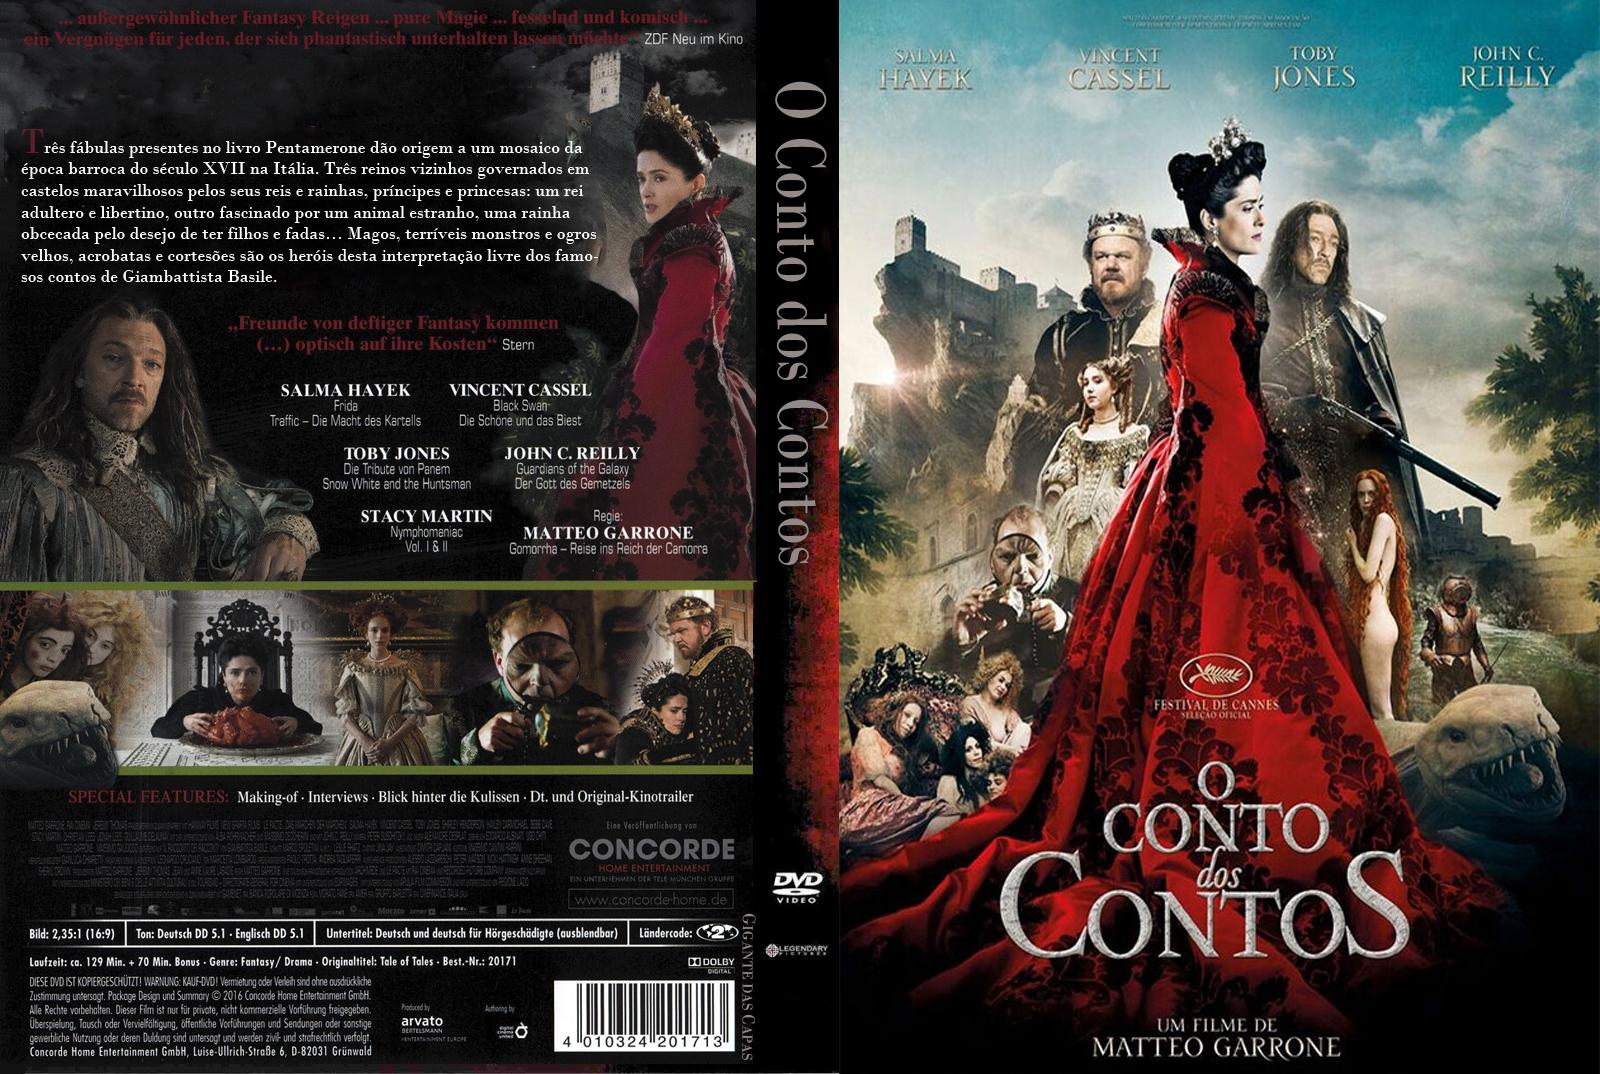 O Conto dos Contos DVD-R O 2BConto 2Bdos 2BContos 2B 25282016 2529 2BGigante 2Bdas 2BCapas